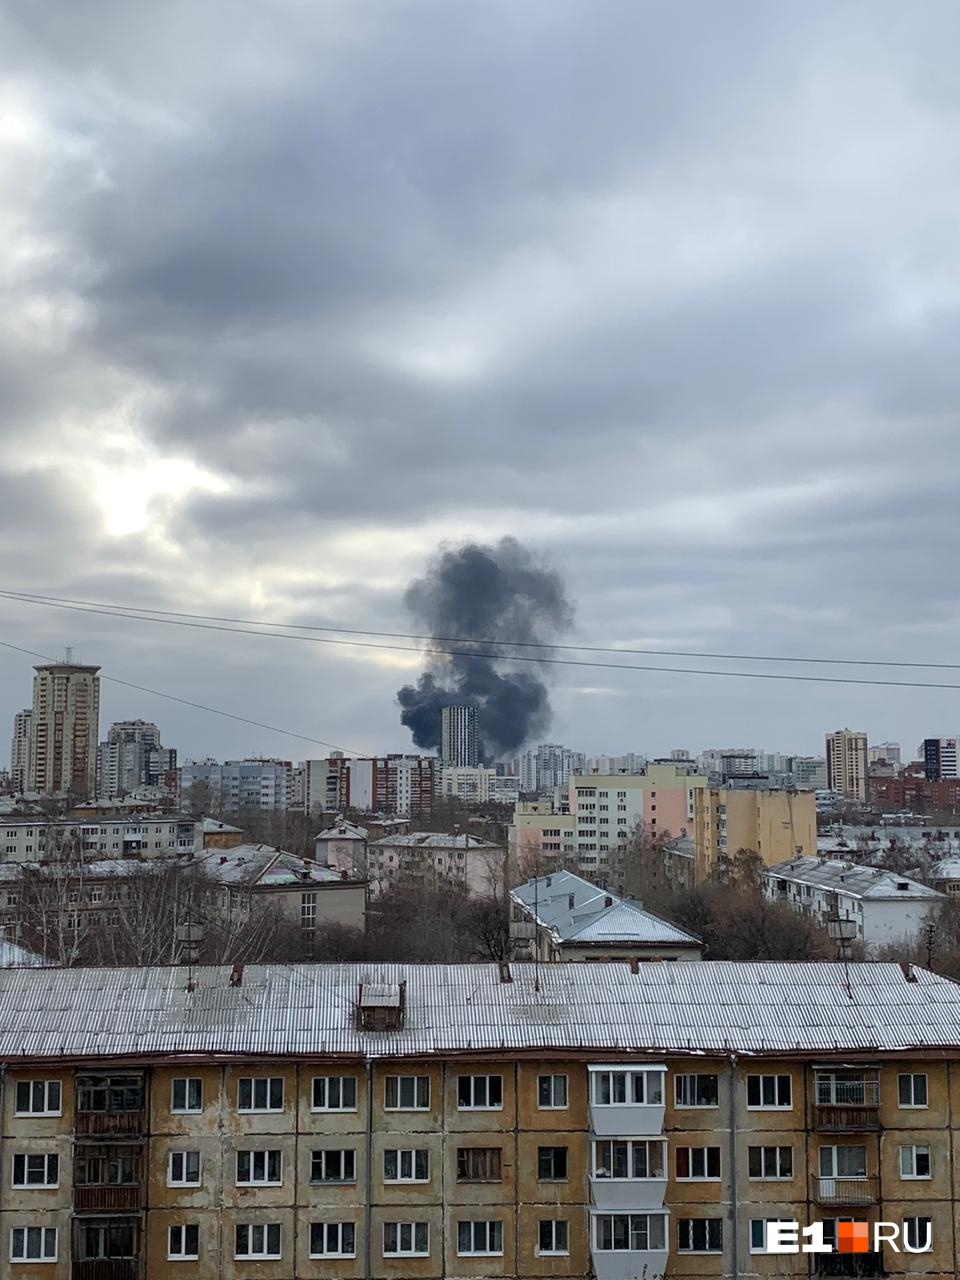 По информации МЧС, горит фасад здания, площадь возгорания — 100 кв. м